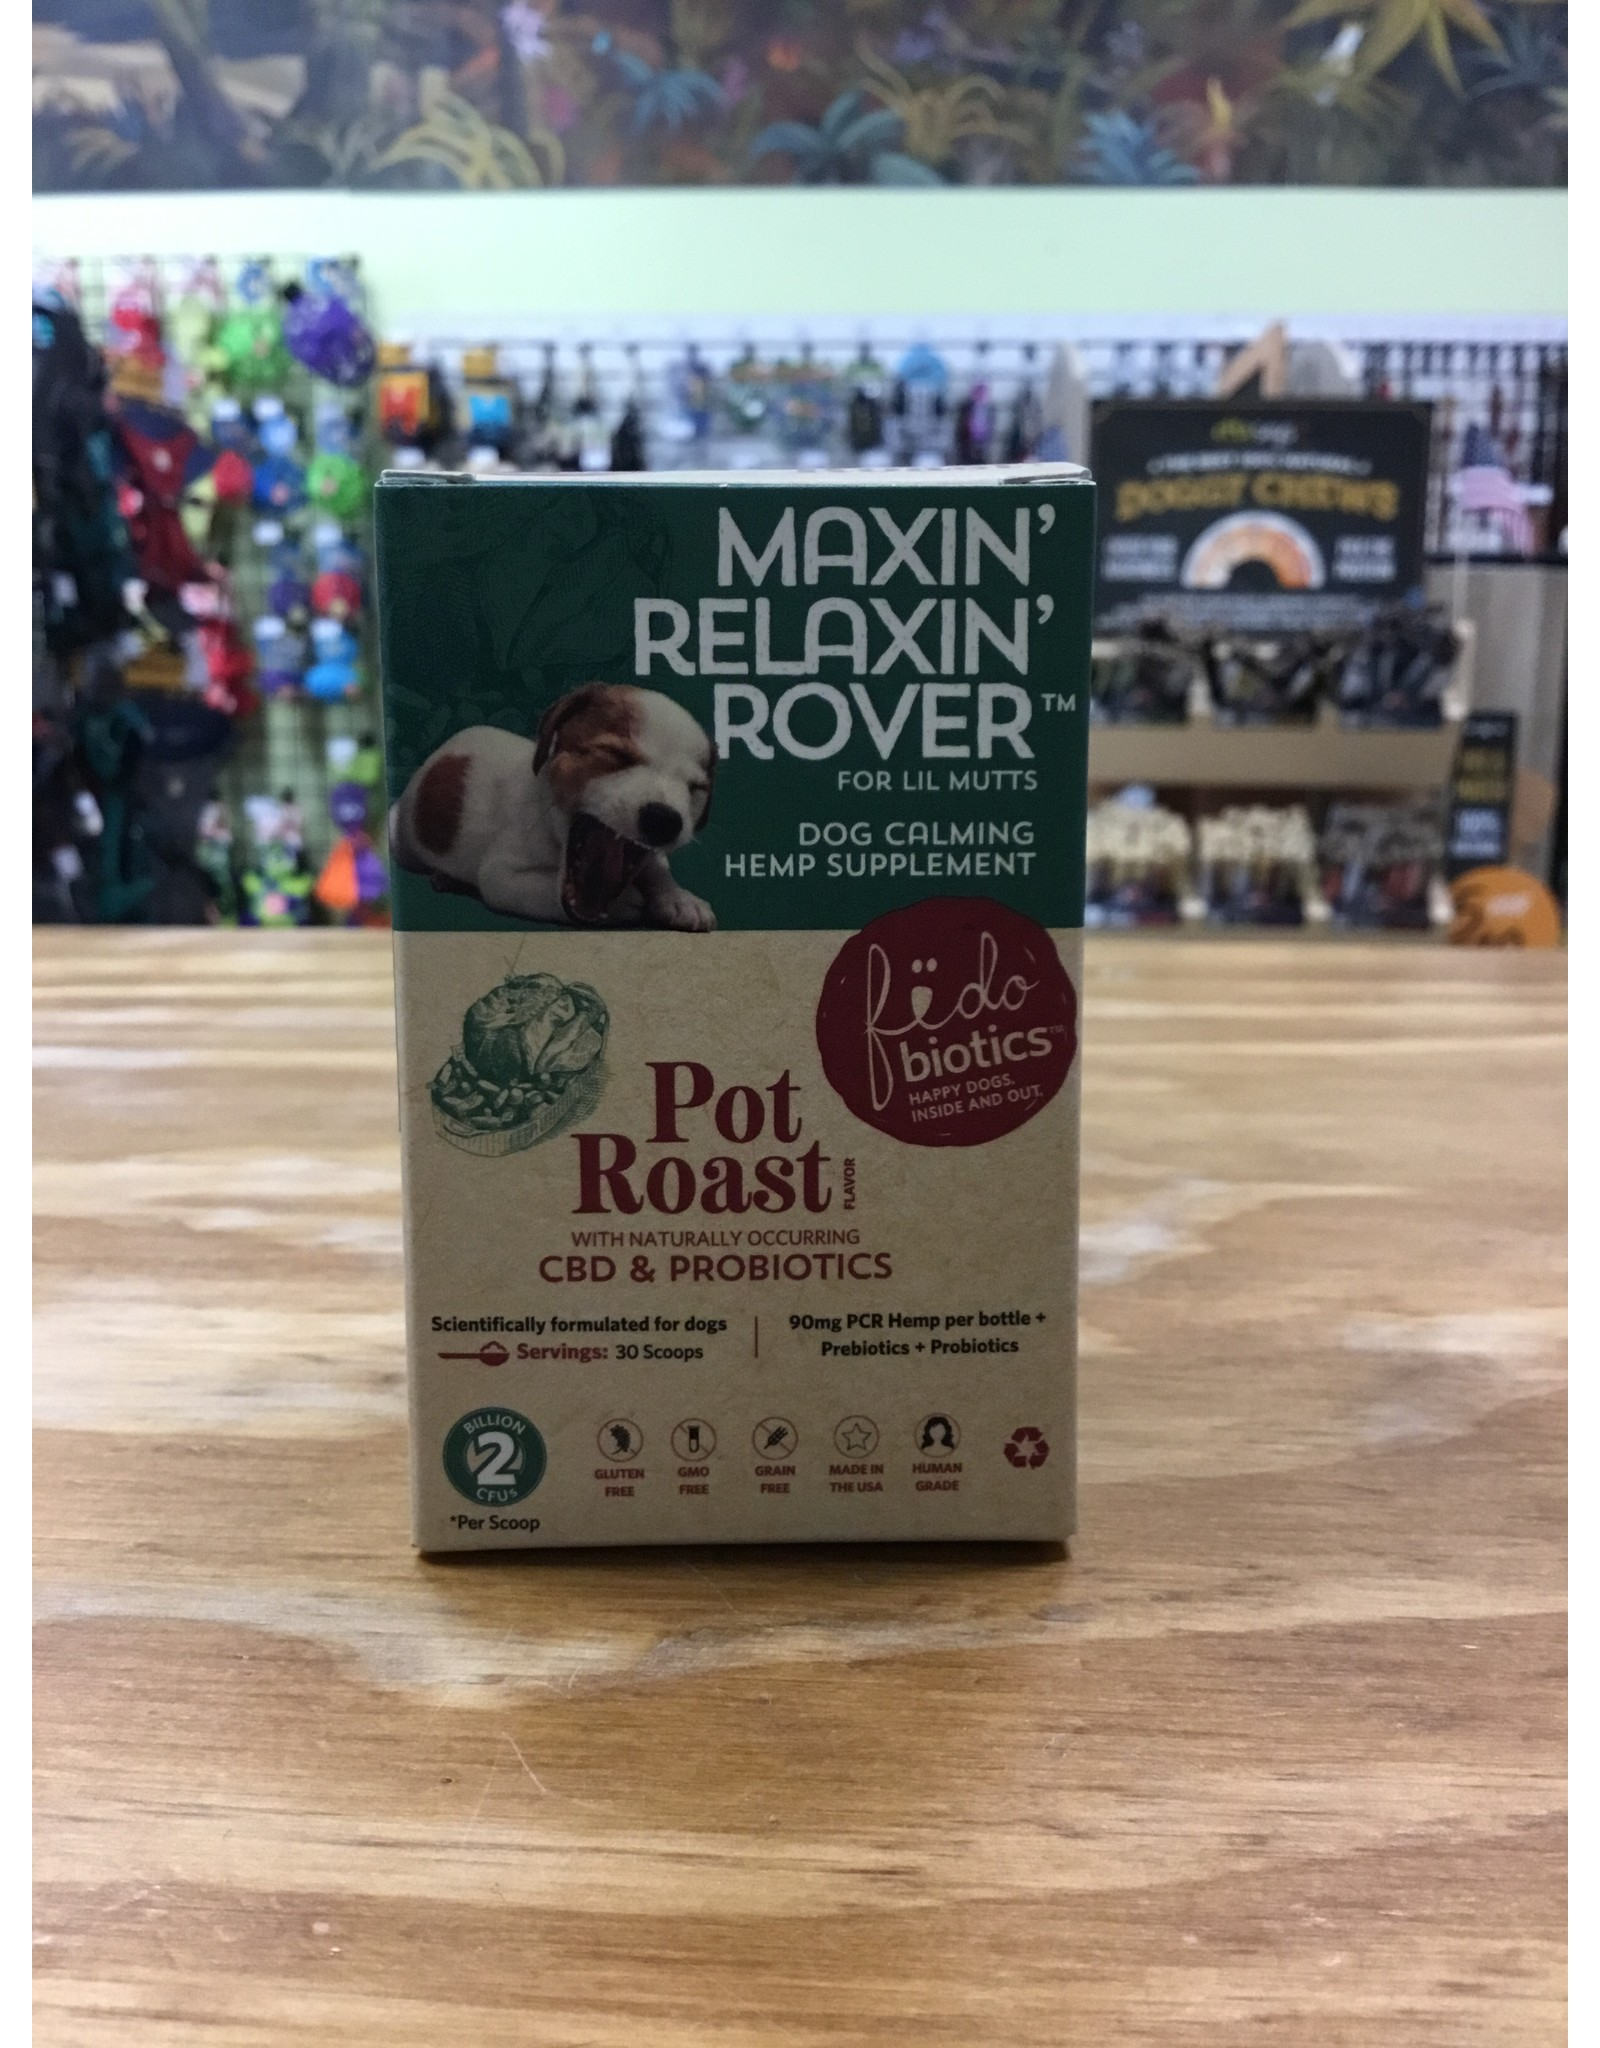 Fidobiotics Fidobiotic: Maxin' Relaxin' Rover Lil